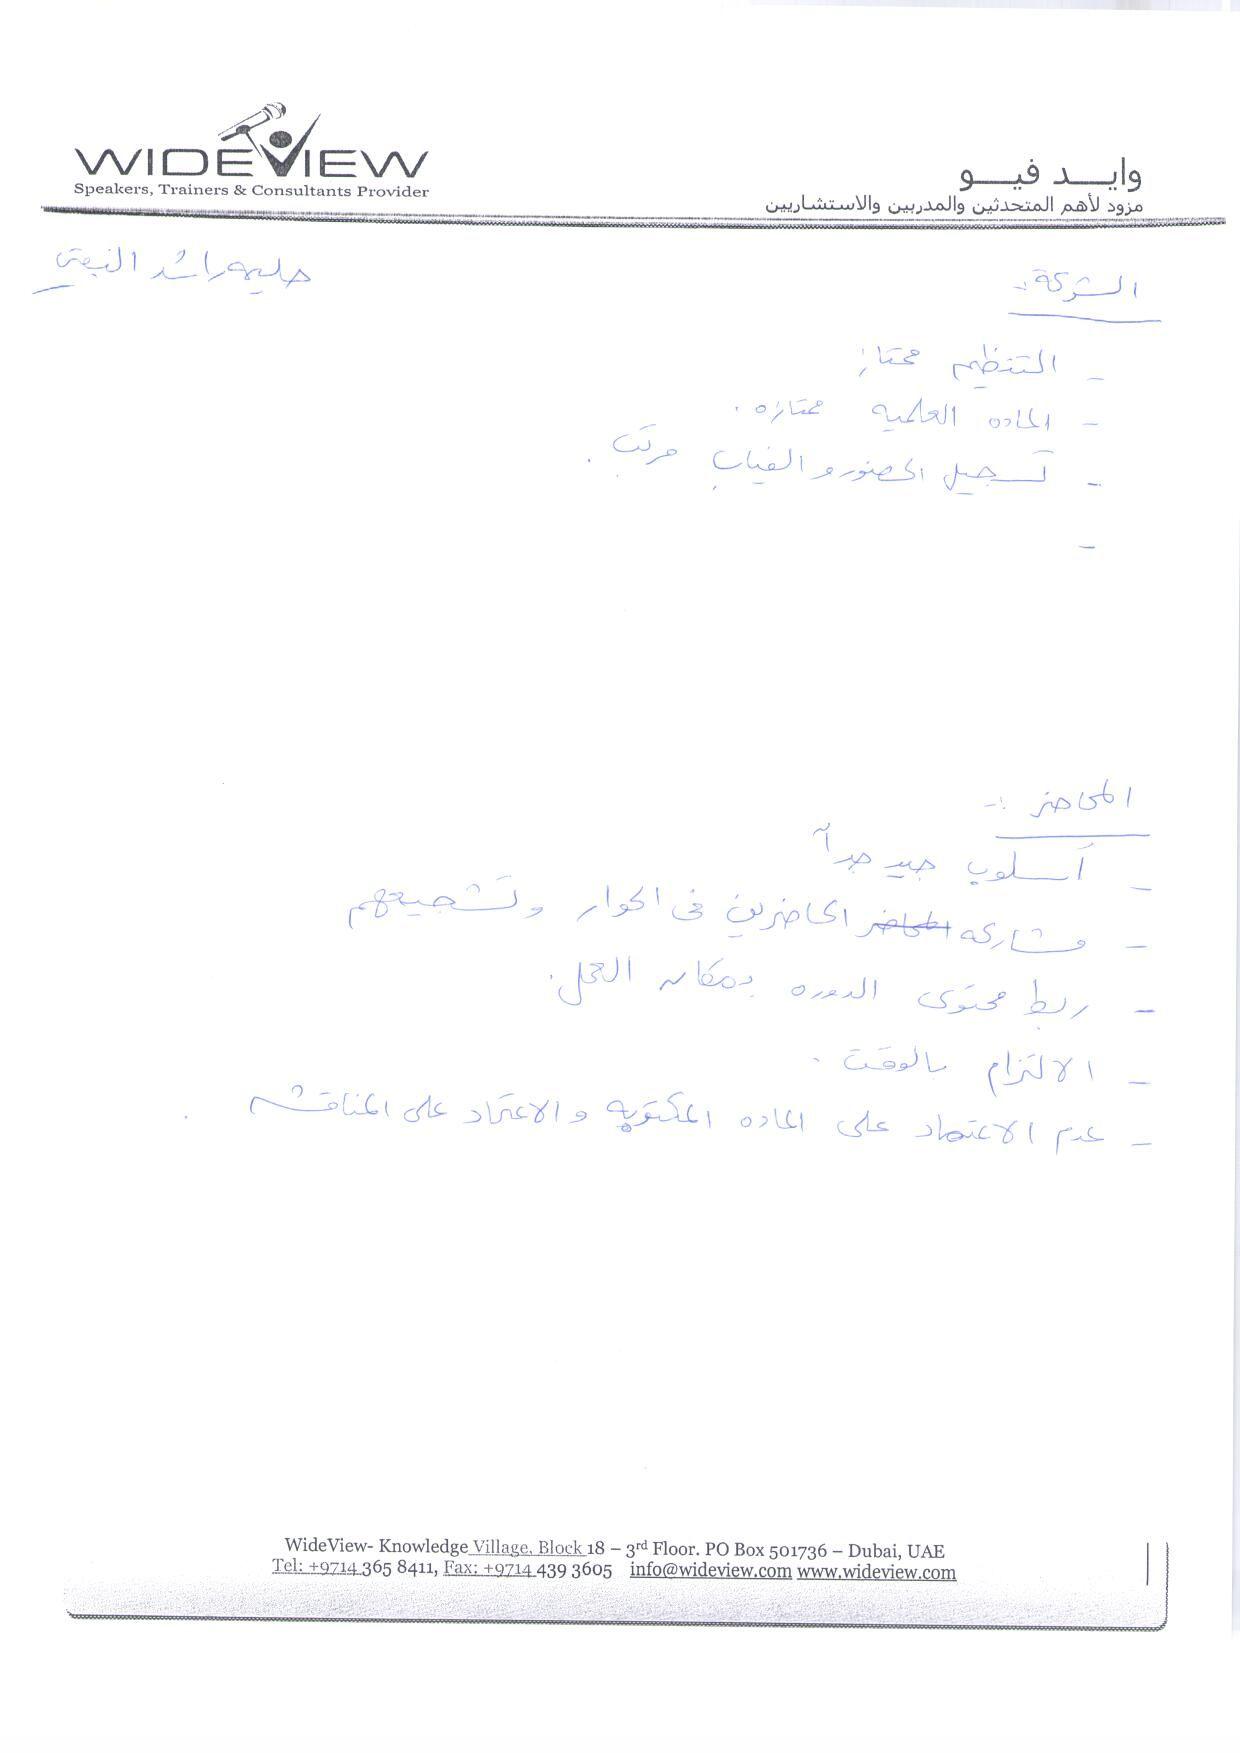 شهادة الحضور دورة دورات تدريب Wideview وايدفيو Safety Knowledge Testimonials Dubai